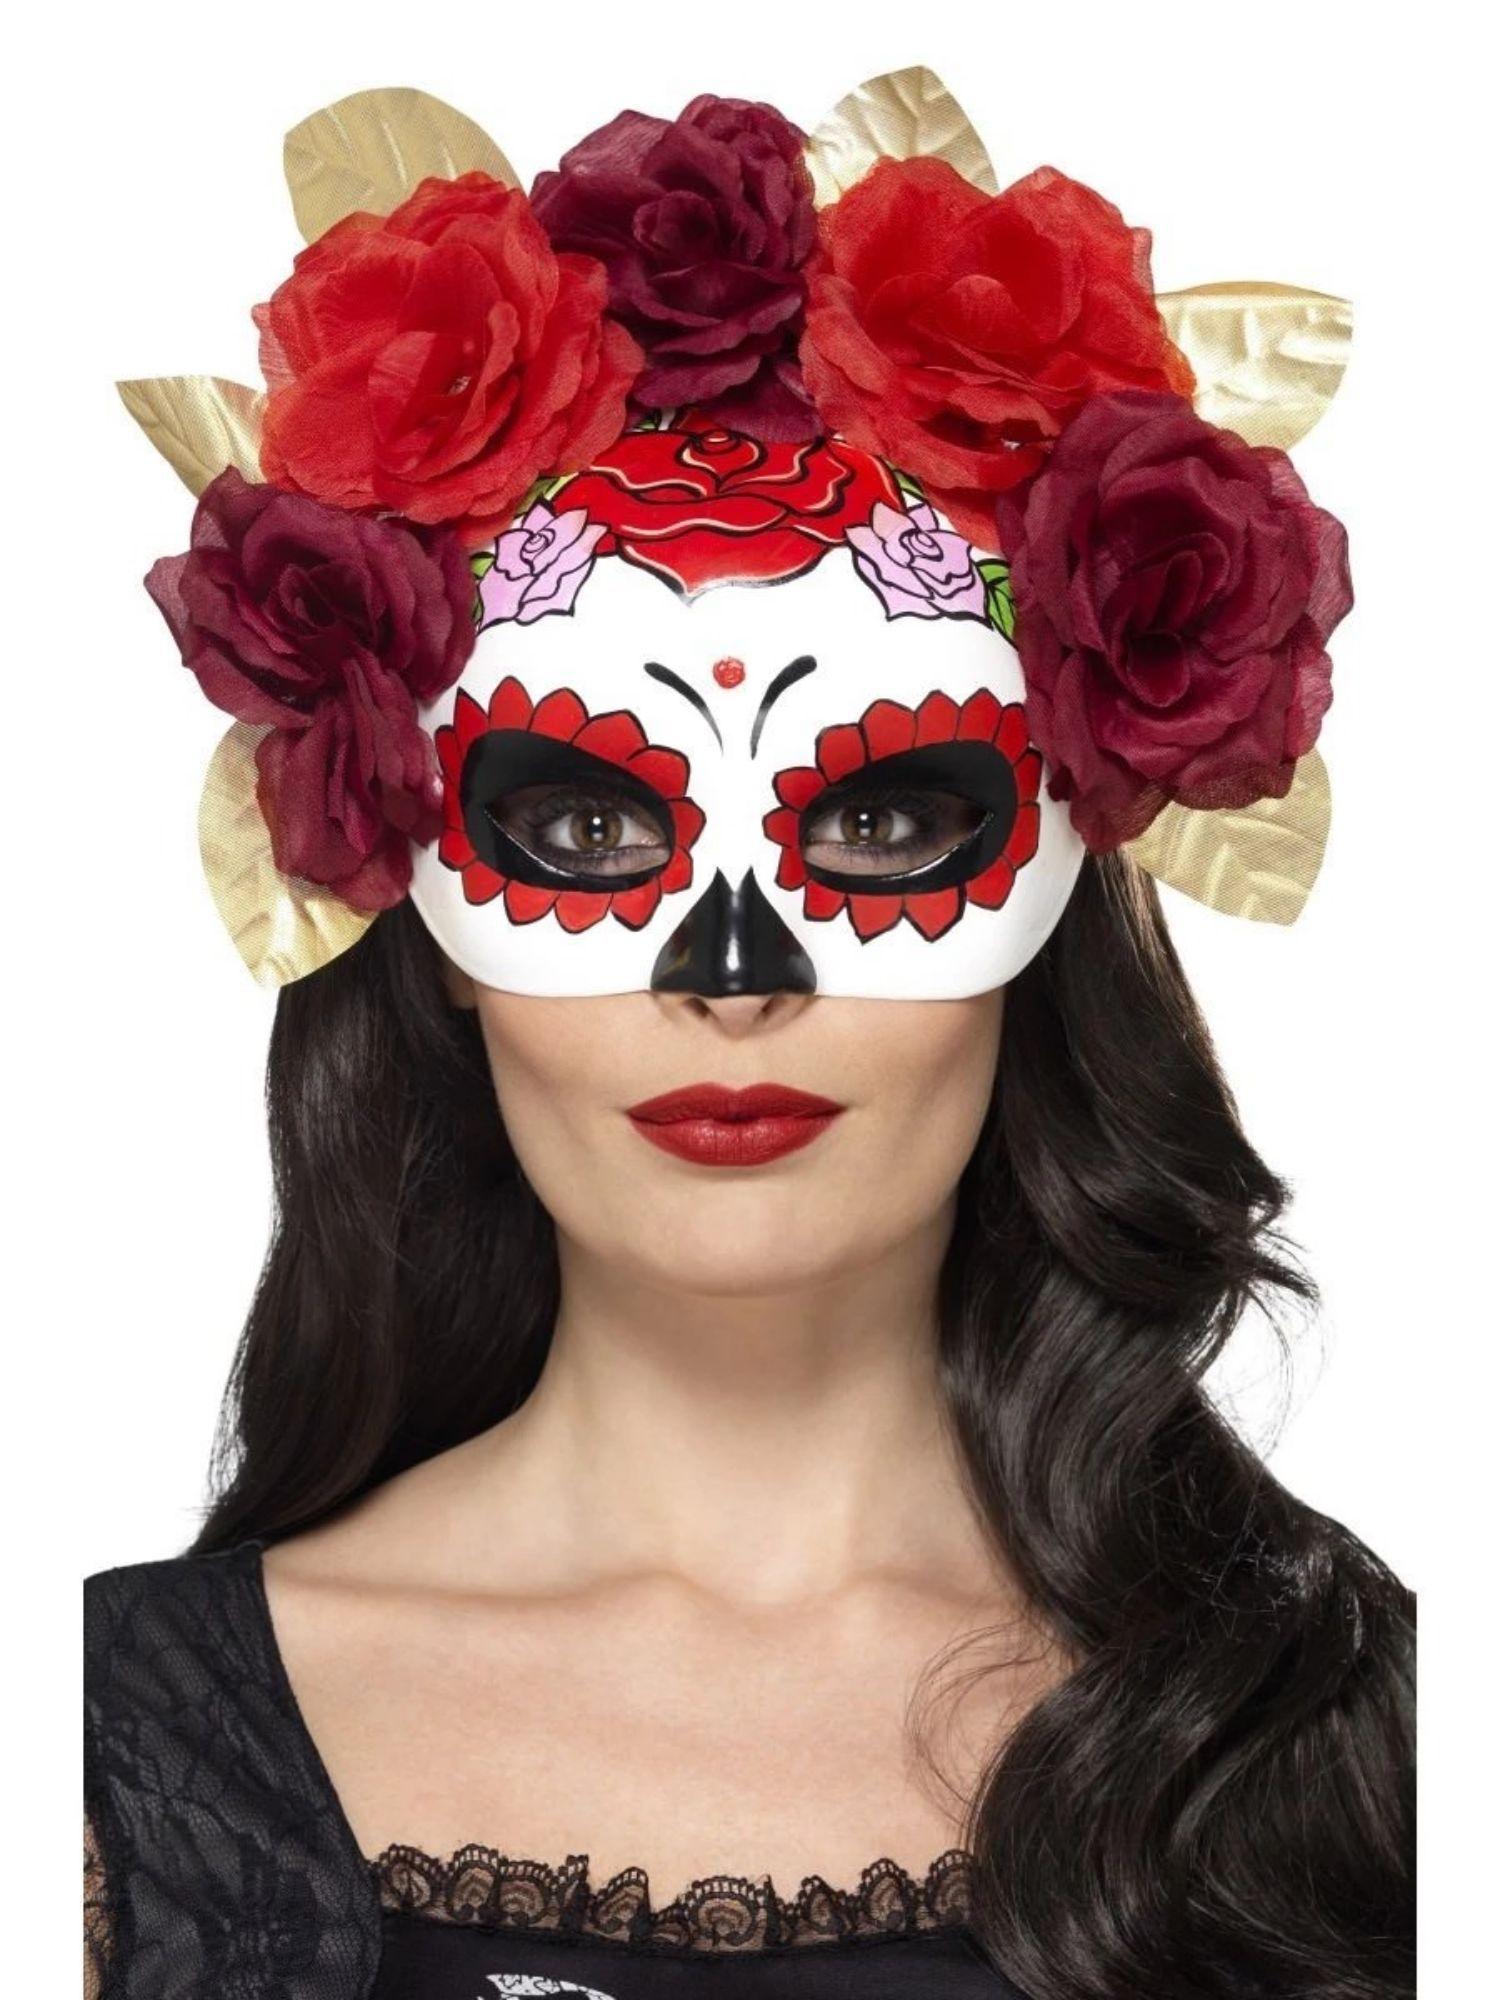 NEW White Sugar skull red rose Masquerade Mask Eye Gothic halloween fancy dress